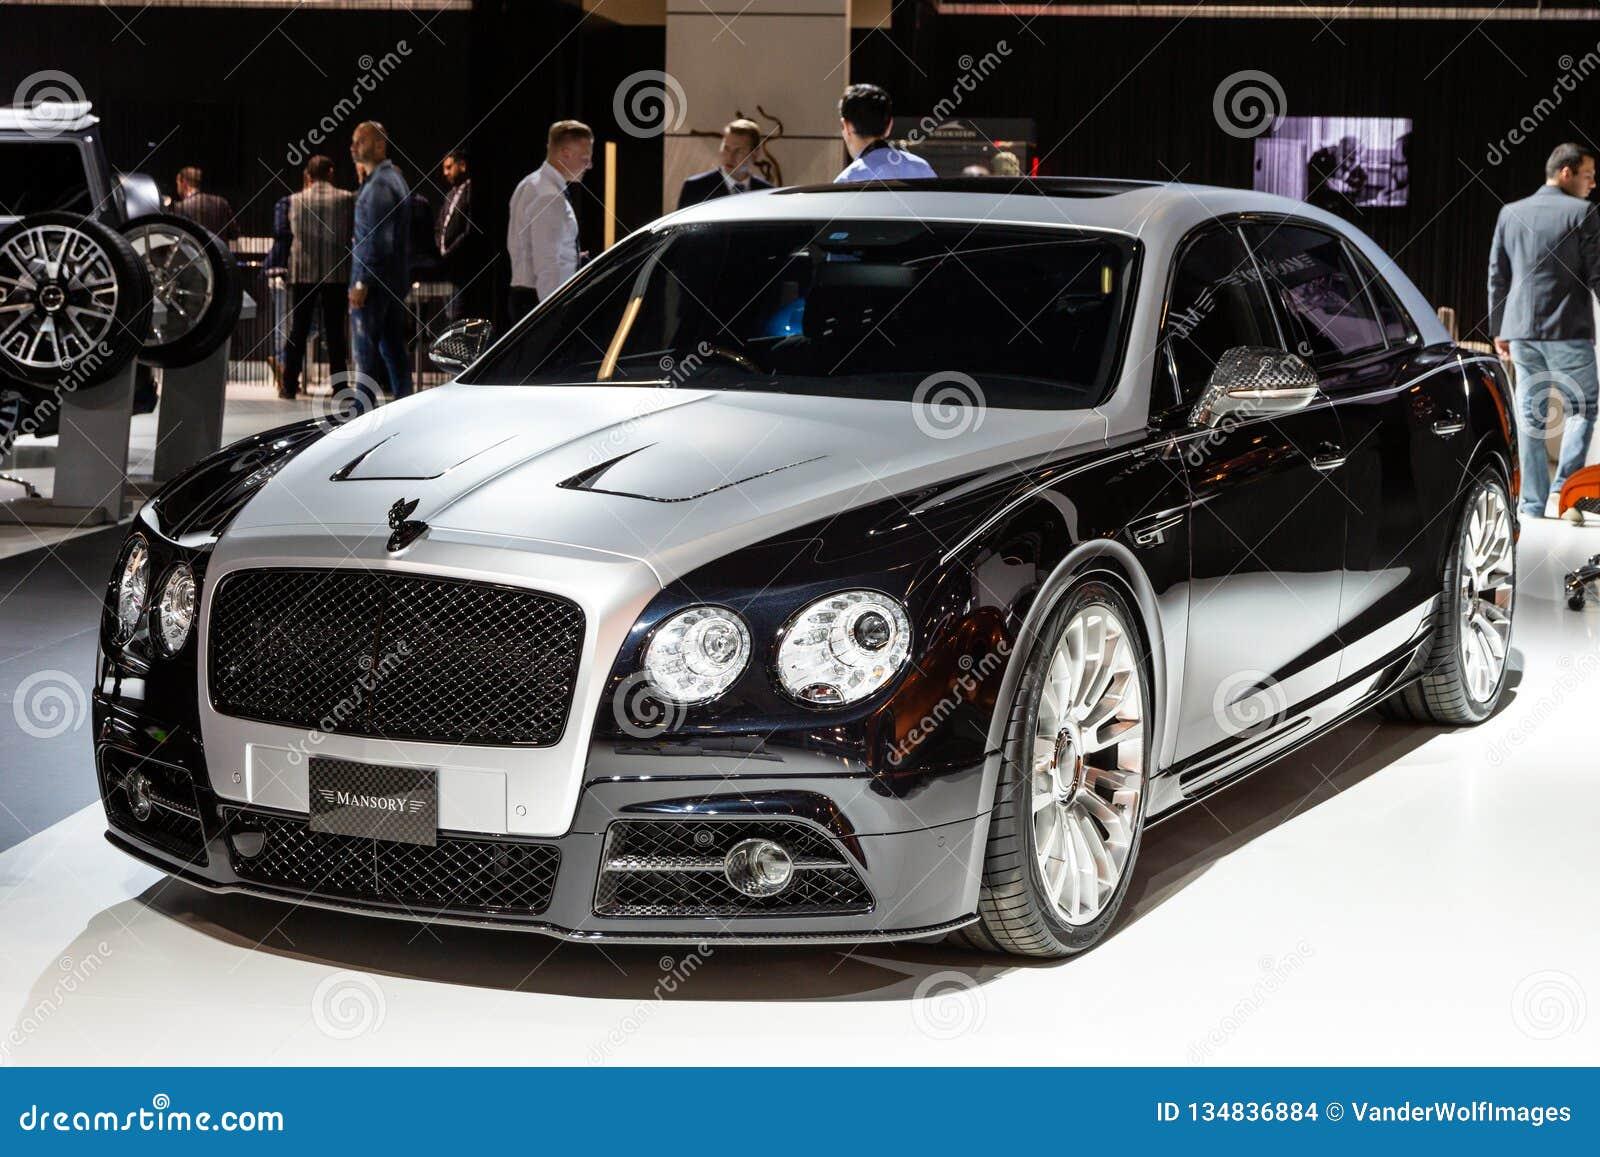 Mansory Bentley Continental Gtc Customized Luxury Car Editorial Stock Image Image Of Show Frankfurt 134836884